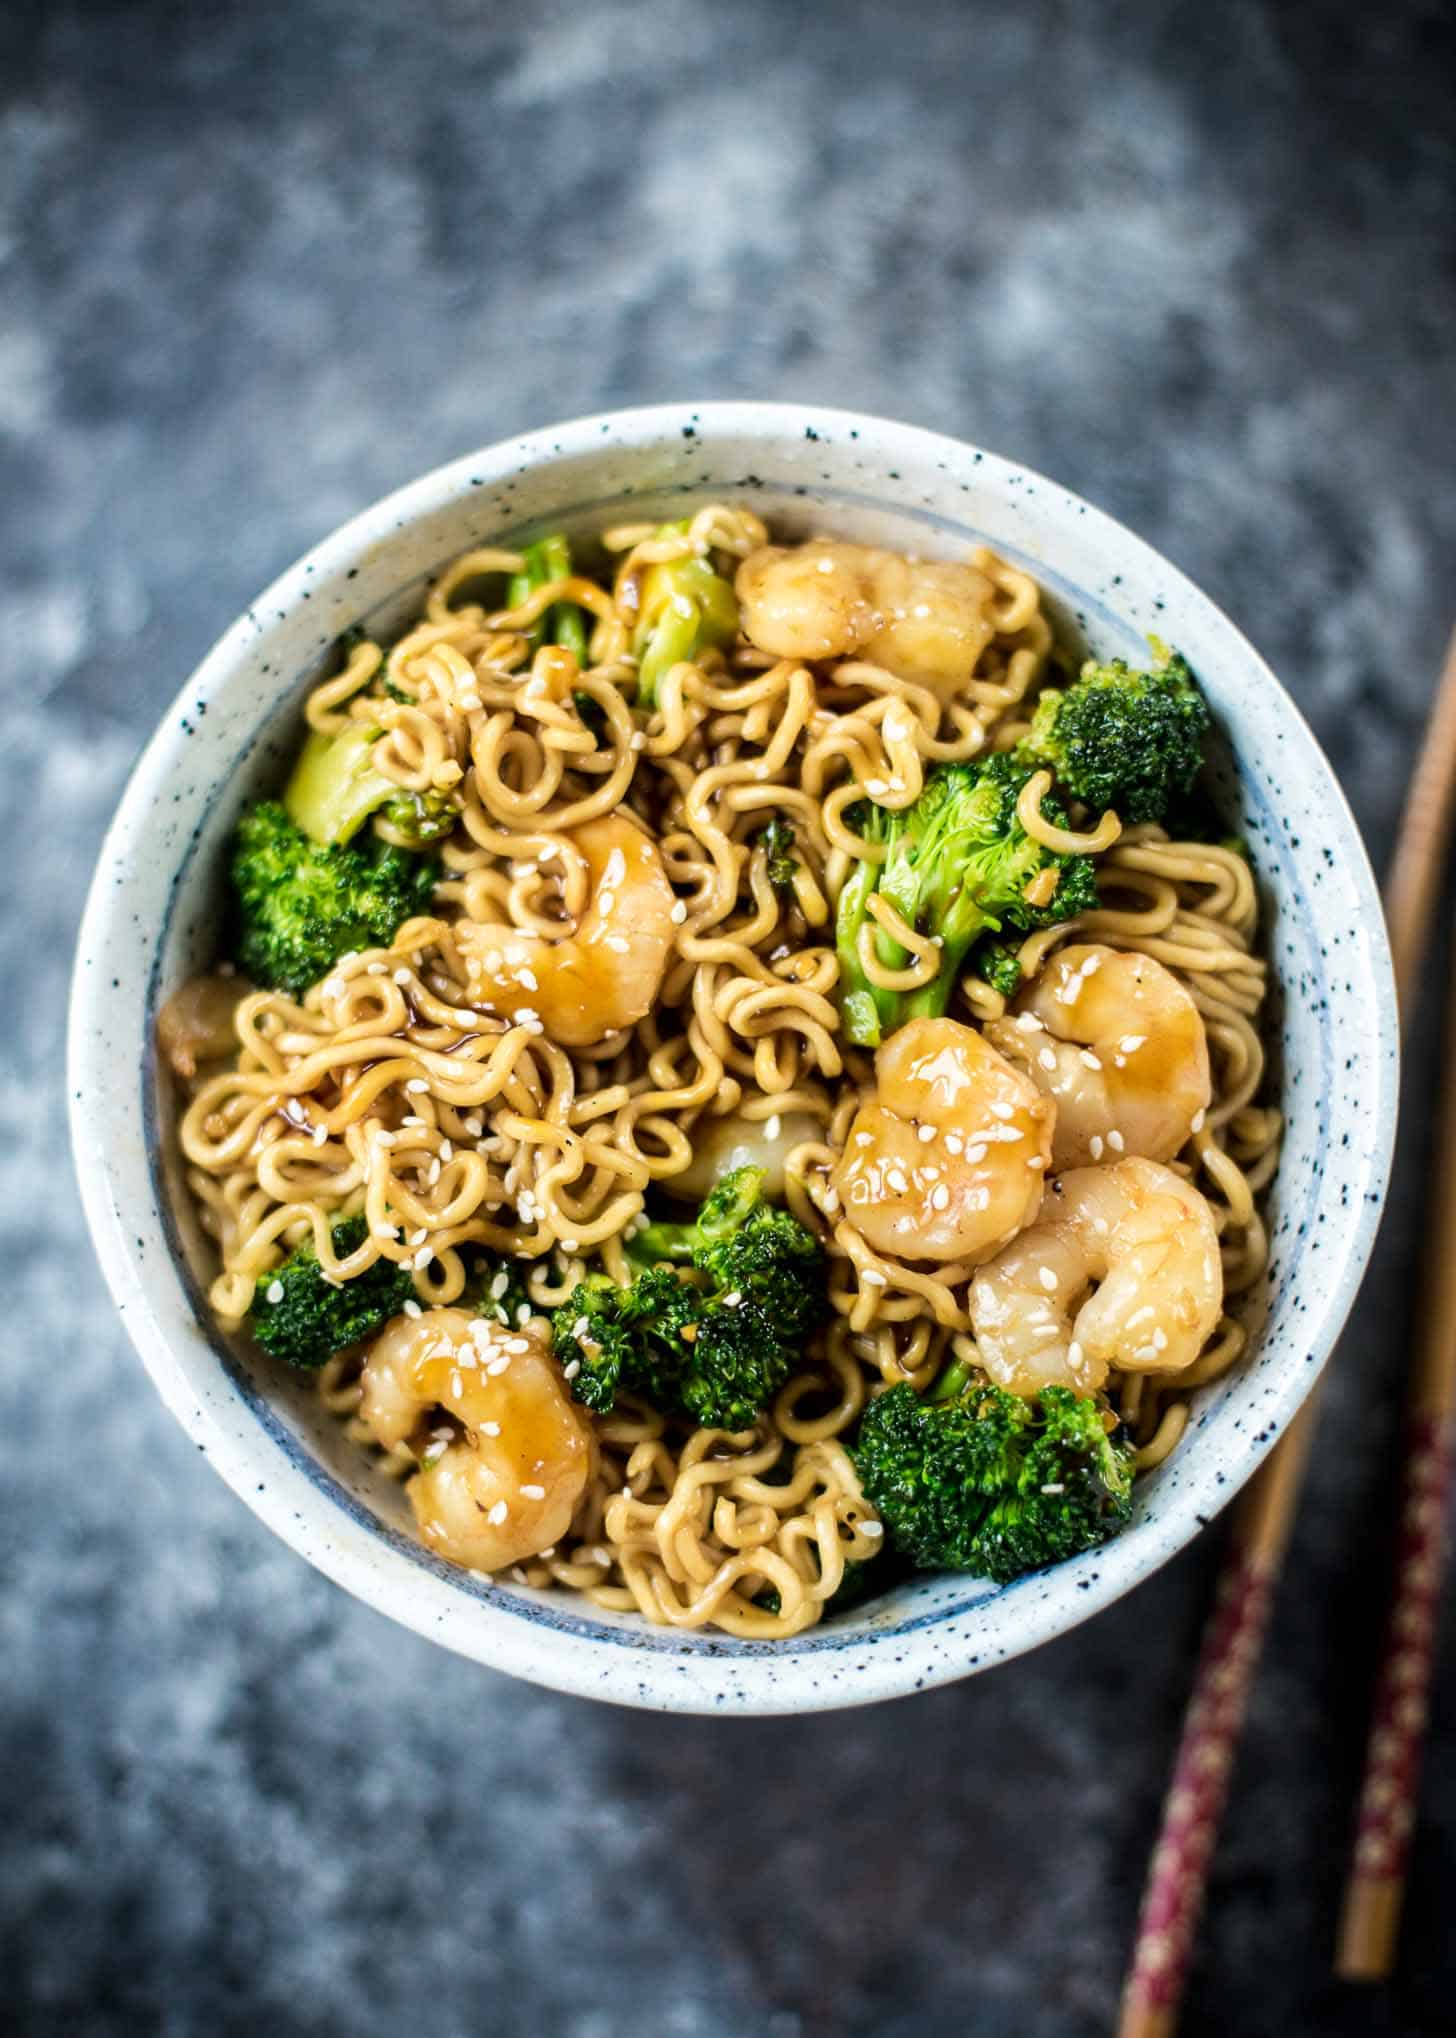 Shrimp Teriyaki Noodle Bowls with chopsticks